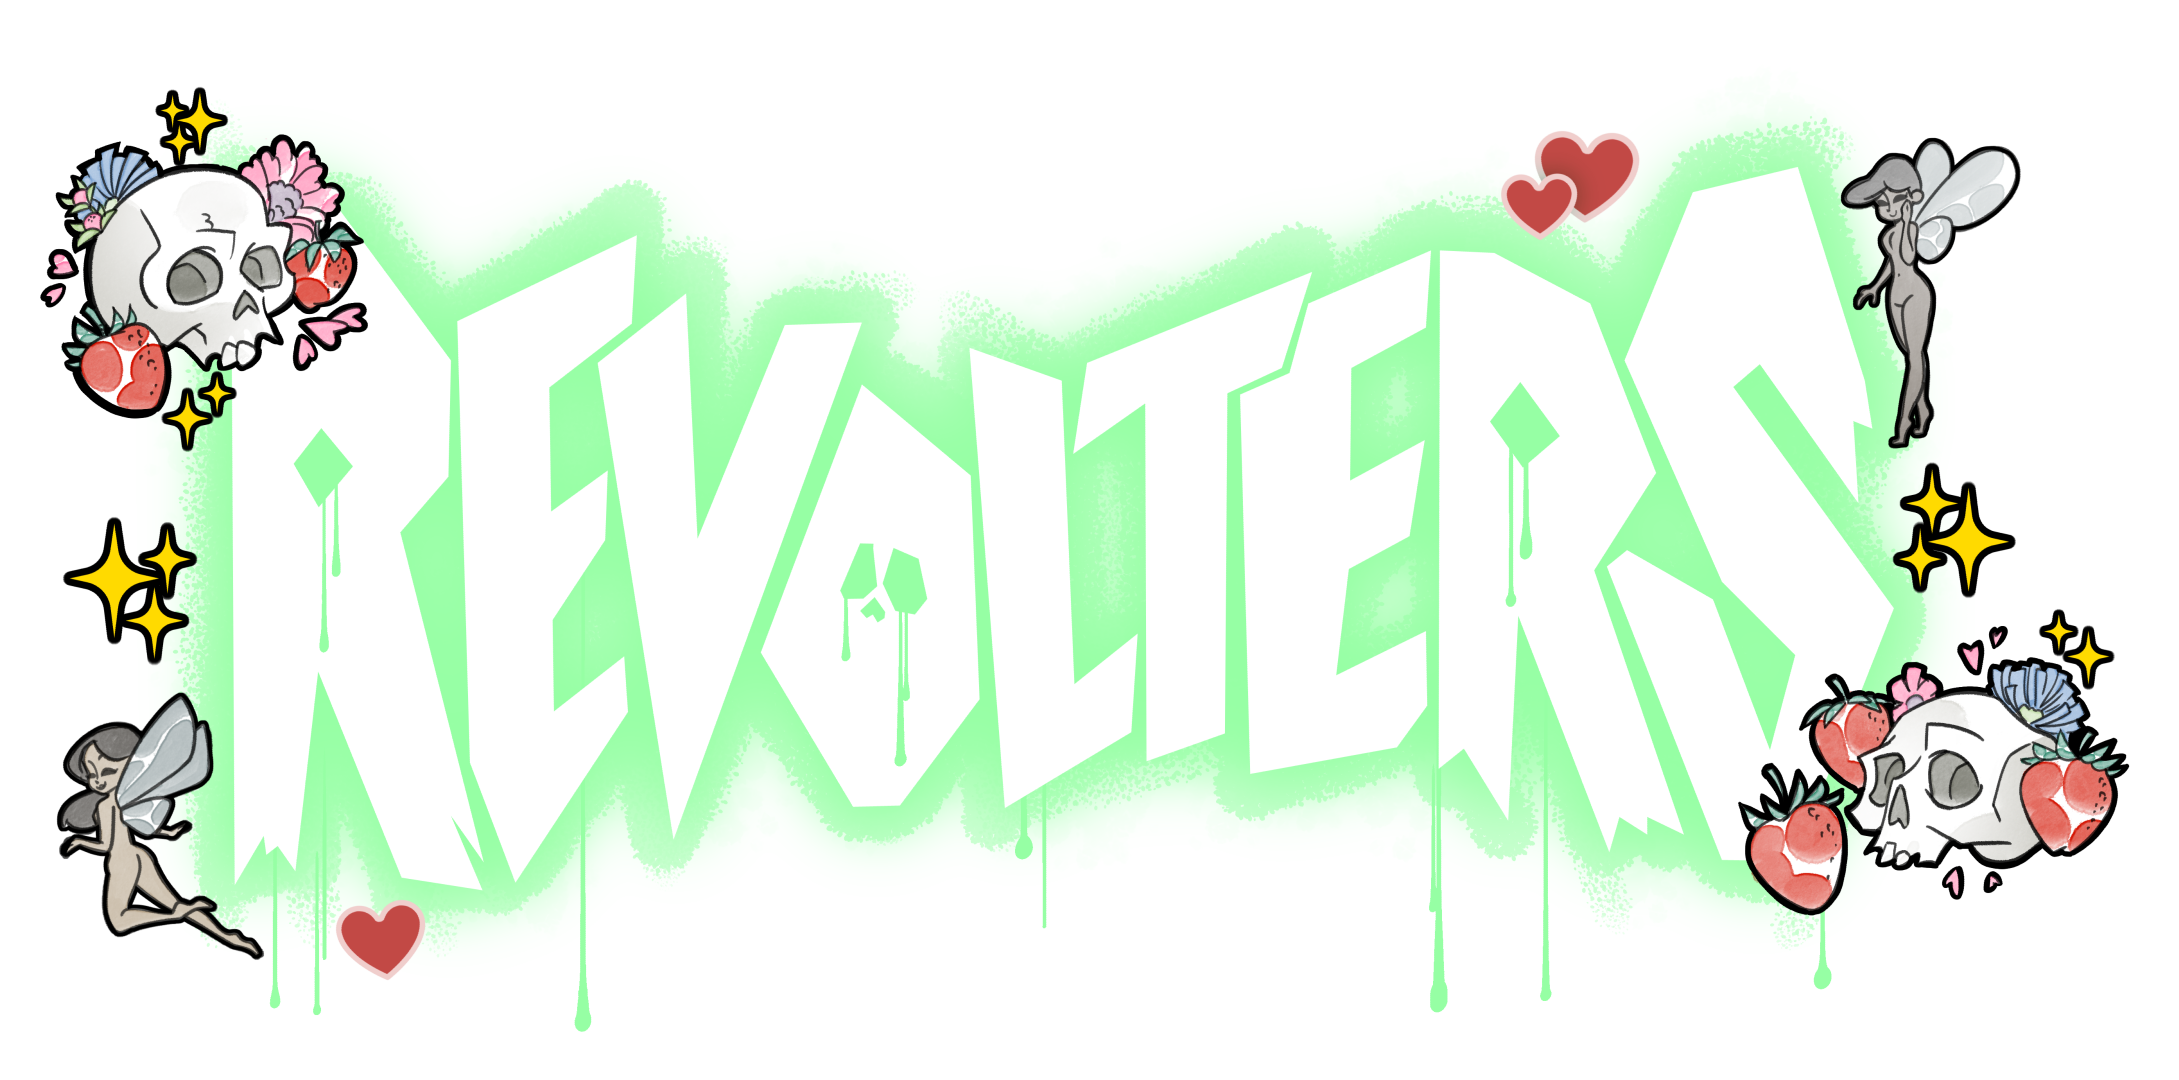 REVOLTERS #1